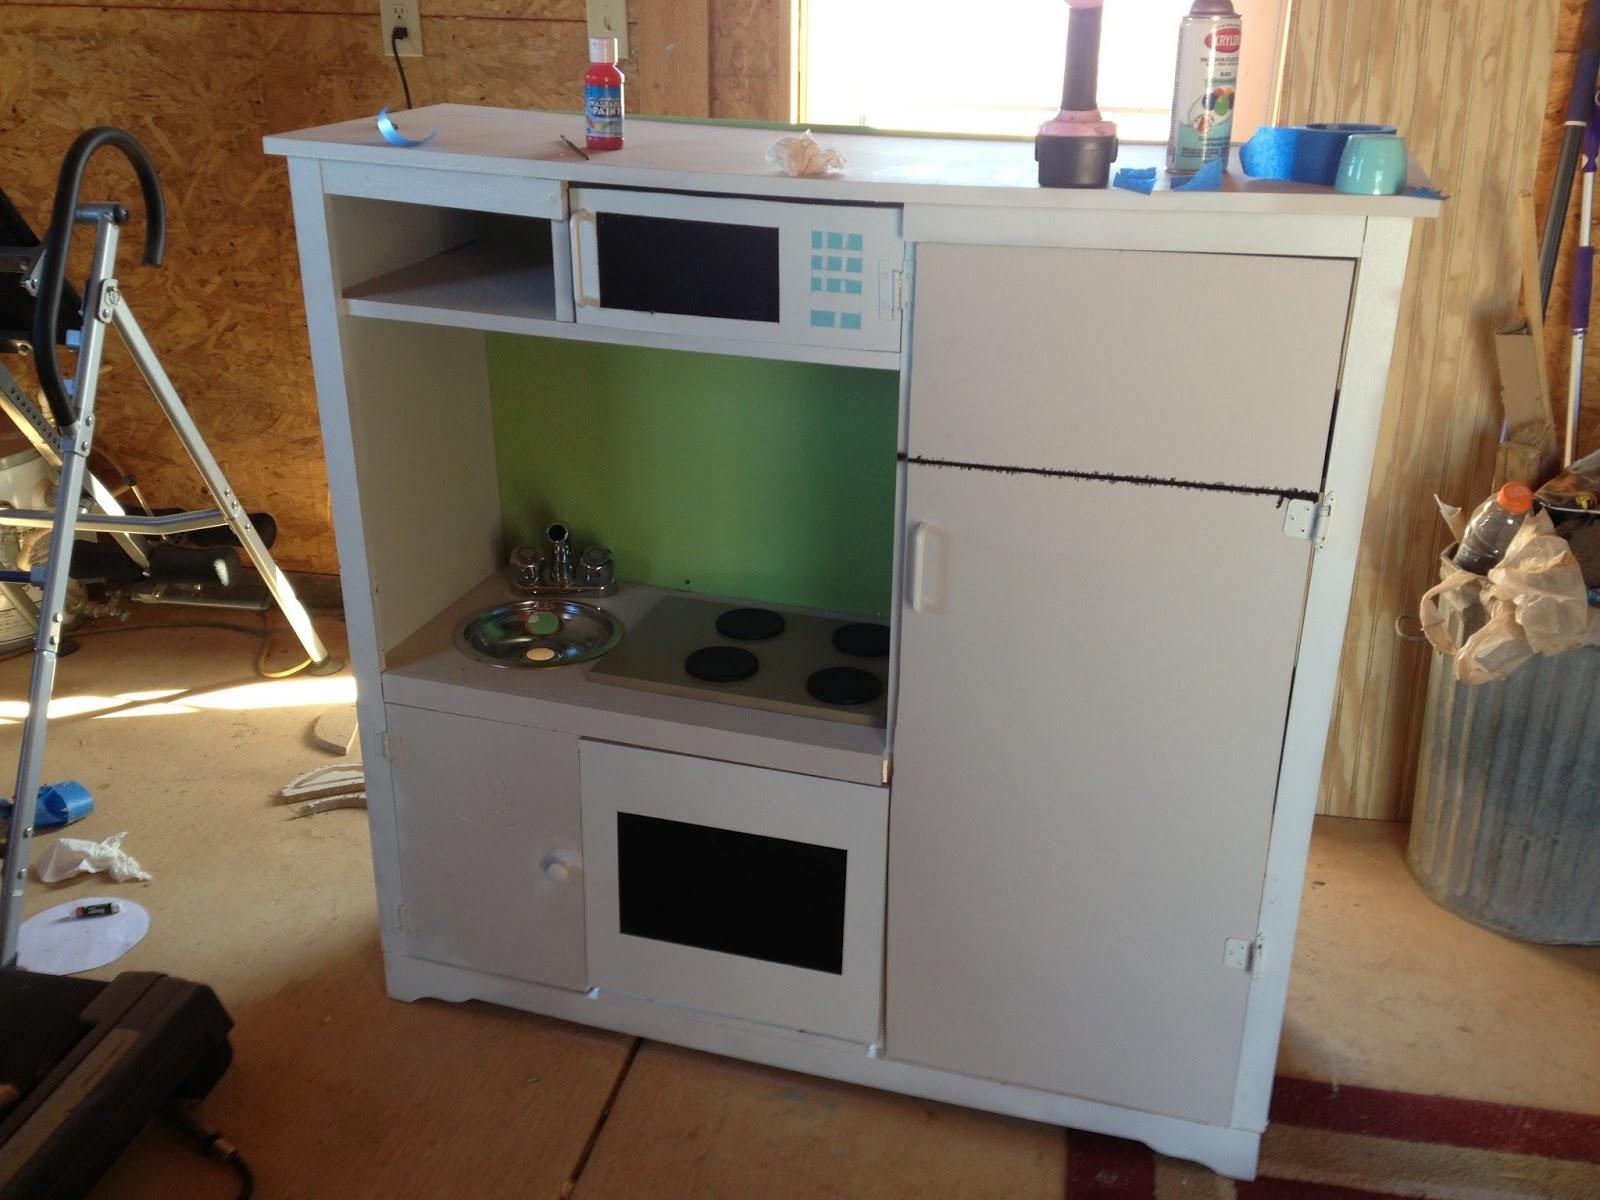 Woodrigued kids kitchenette for Childrens kitchenette